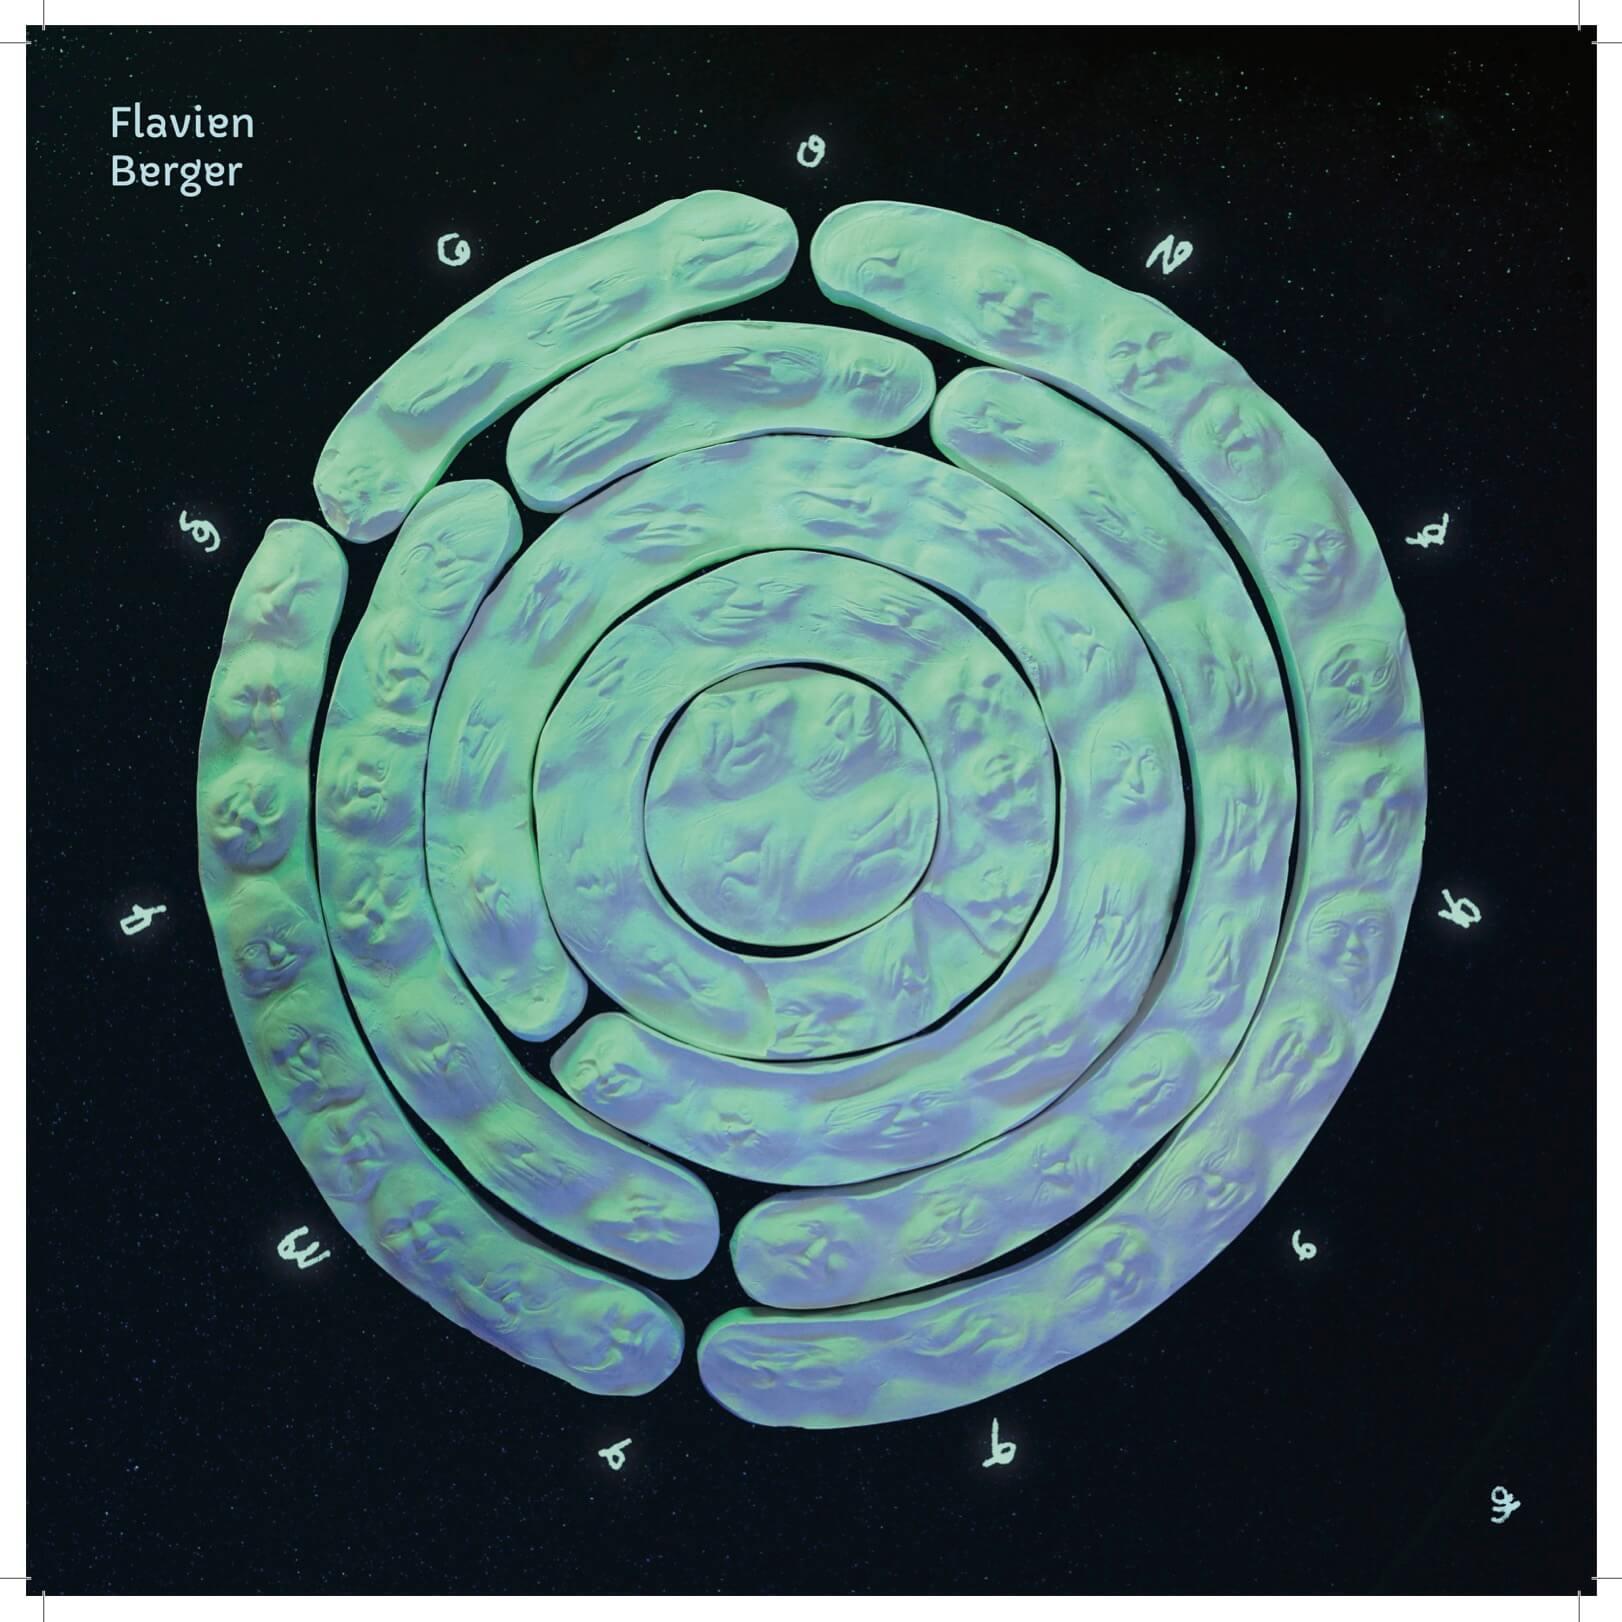 flavien-berger-cover-album.jpg